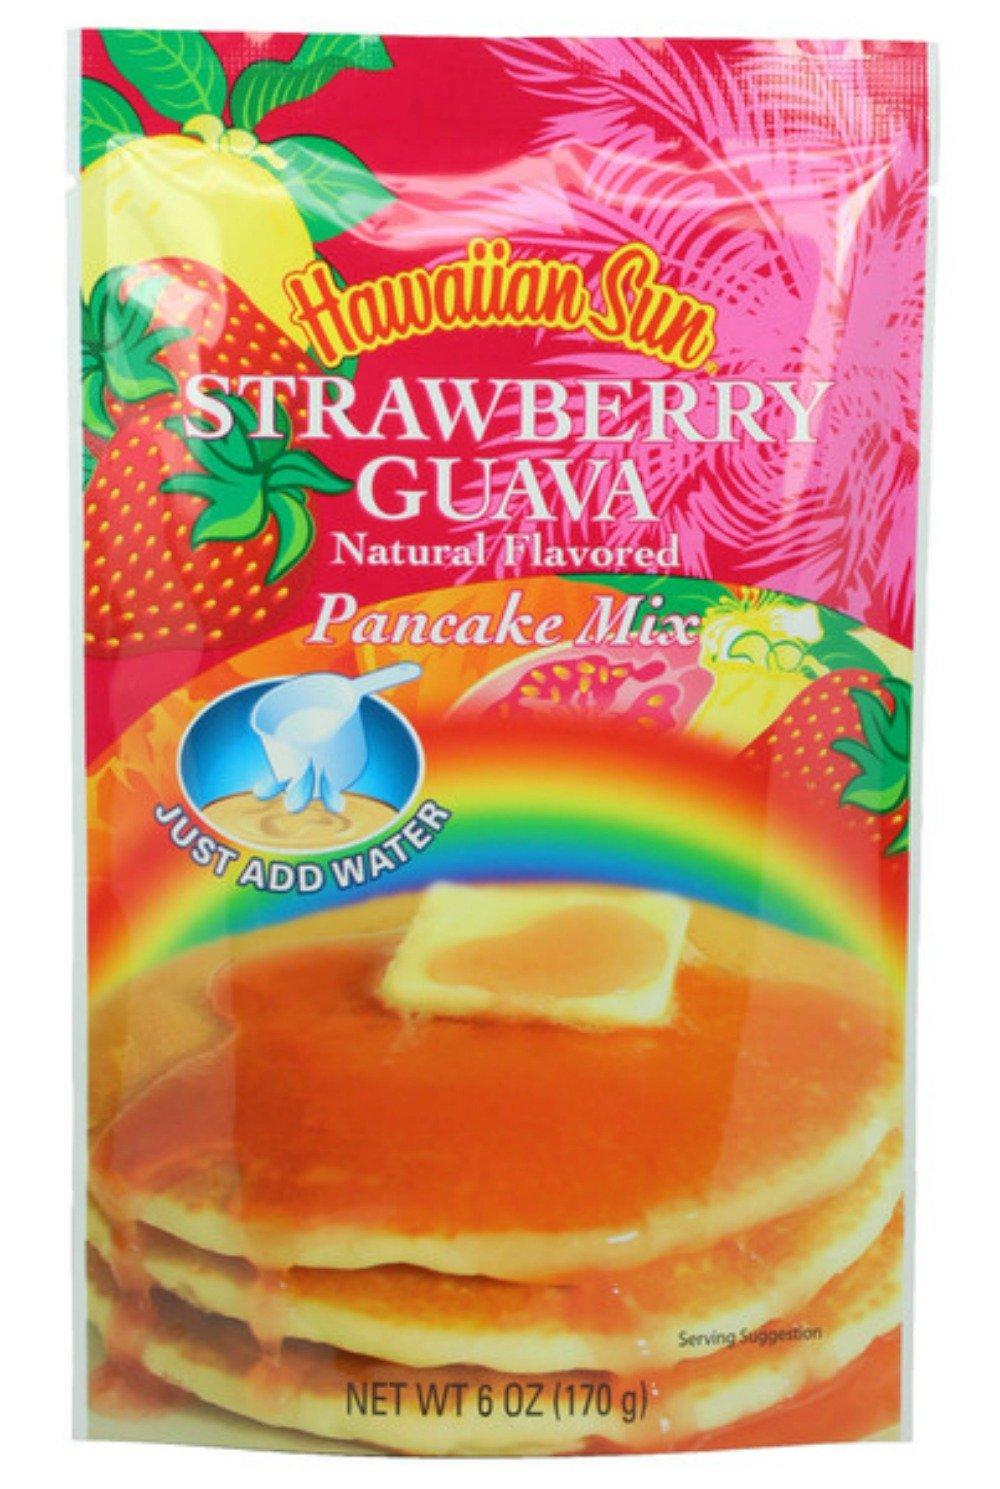 Hawaiian Sun 5 Pack Assorted Pancake Mix: Chocolate Mac, Passion Fruit, Banana Mac Nut, Coconut Pineapple. by Hawaiian Sun (Image #5)